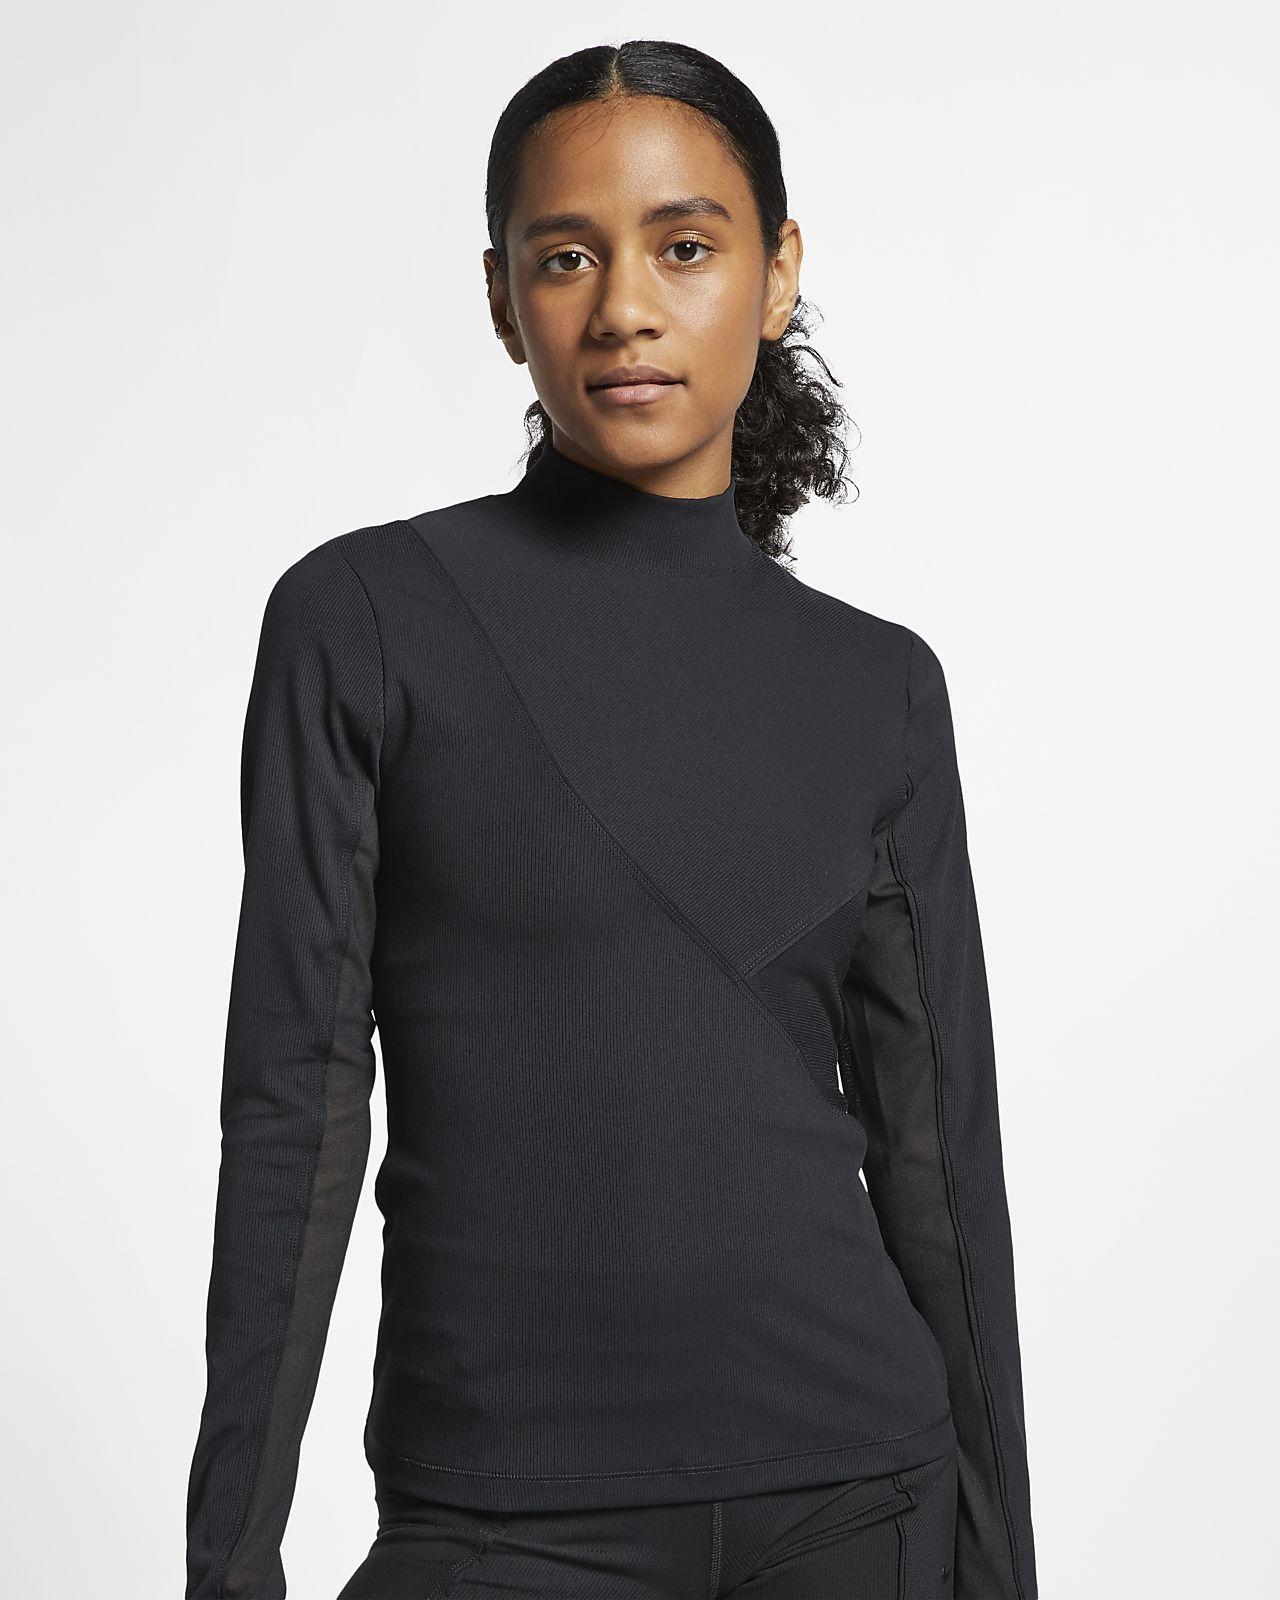 Nike Pro HyperCool Women's Ribbed Long-Sleeve Yoga Top